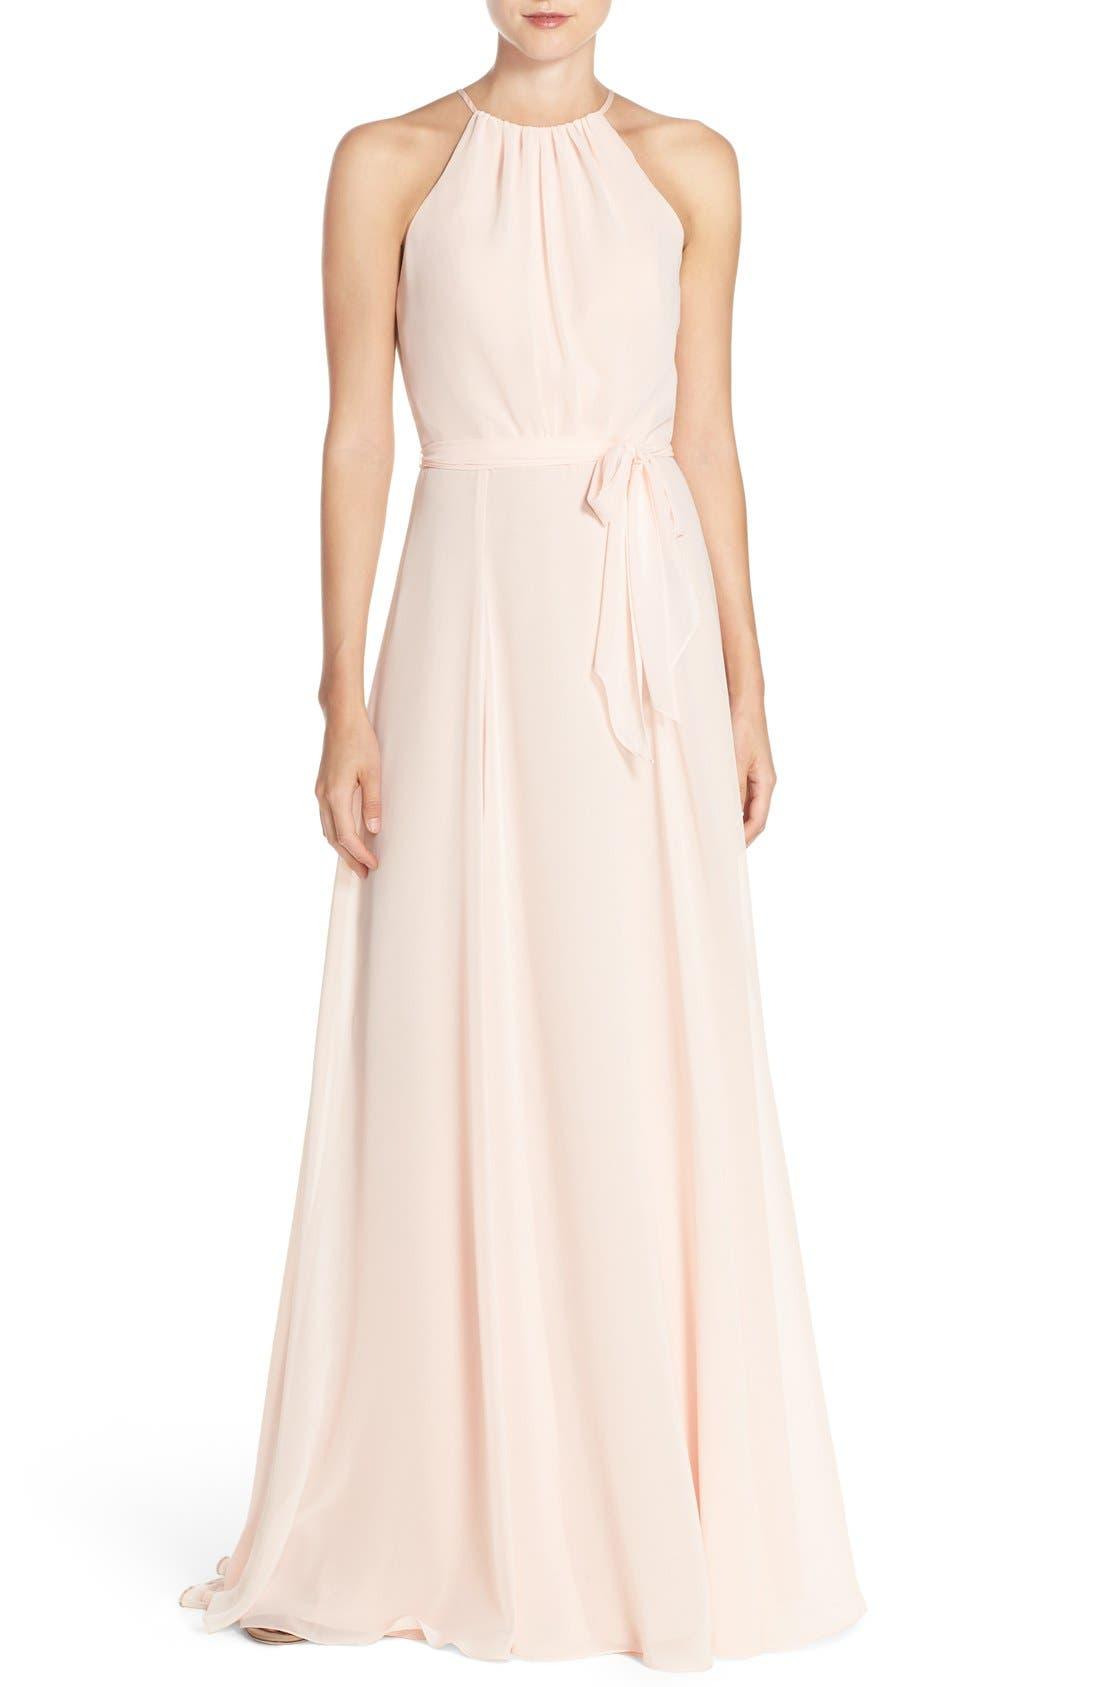 'Delaney' Belted A-Line Chiffon Halter Dress,                             Main thumbnail 4, color,